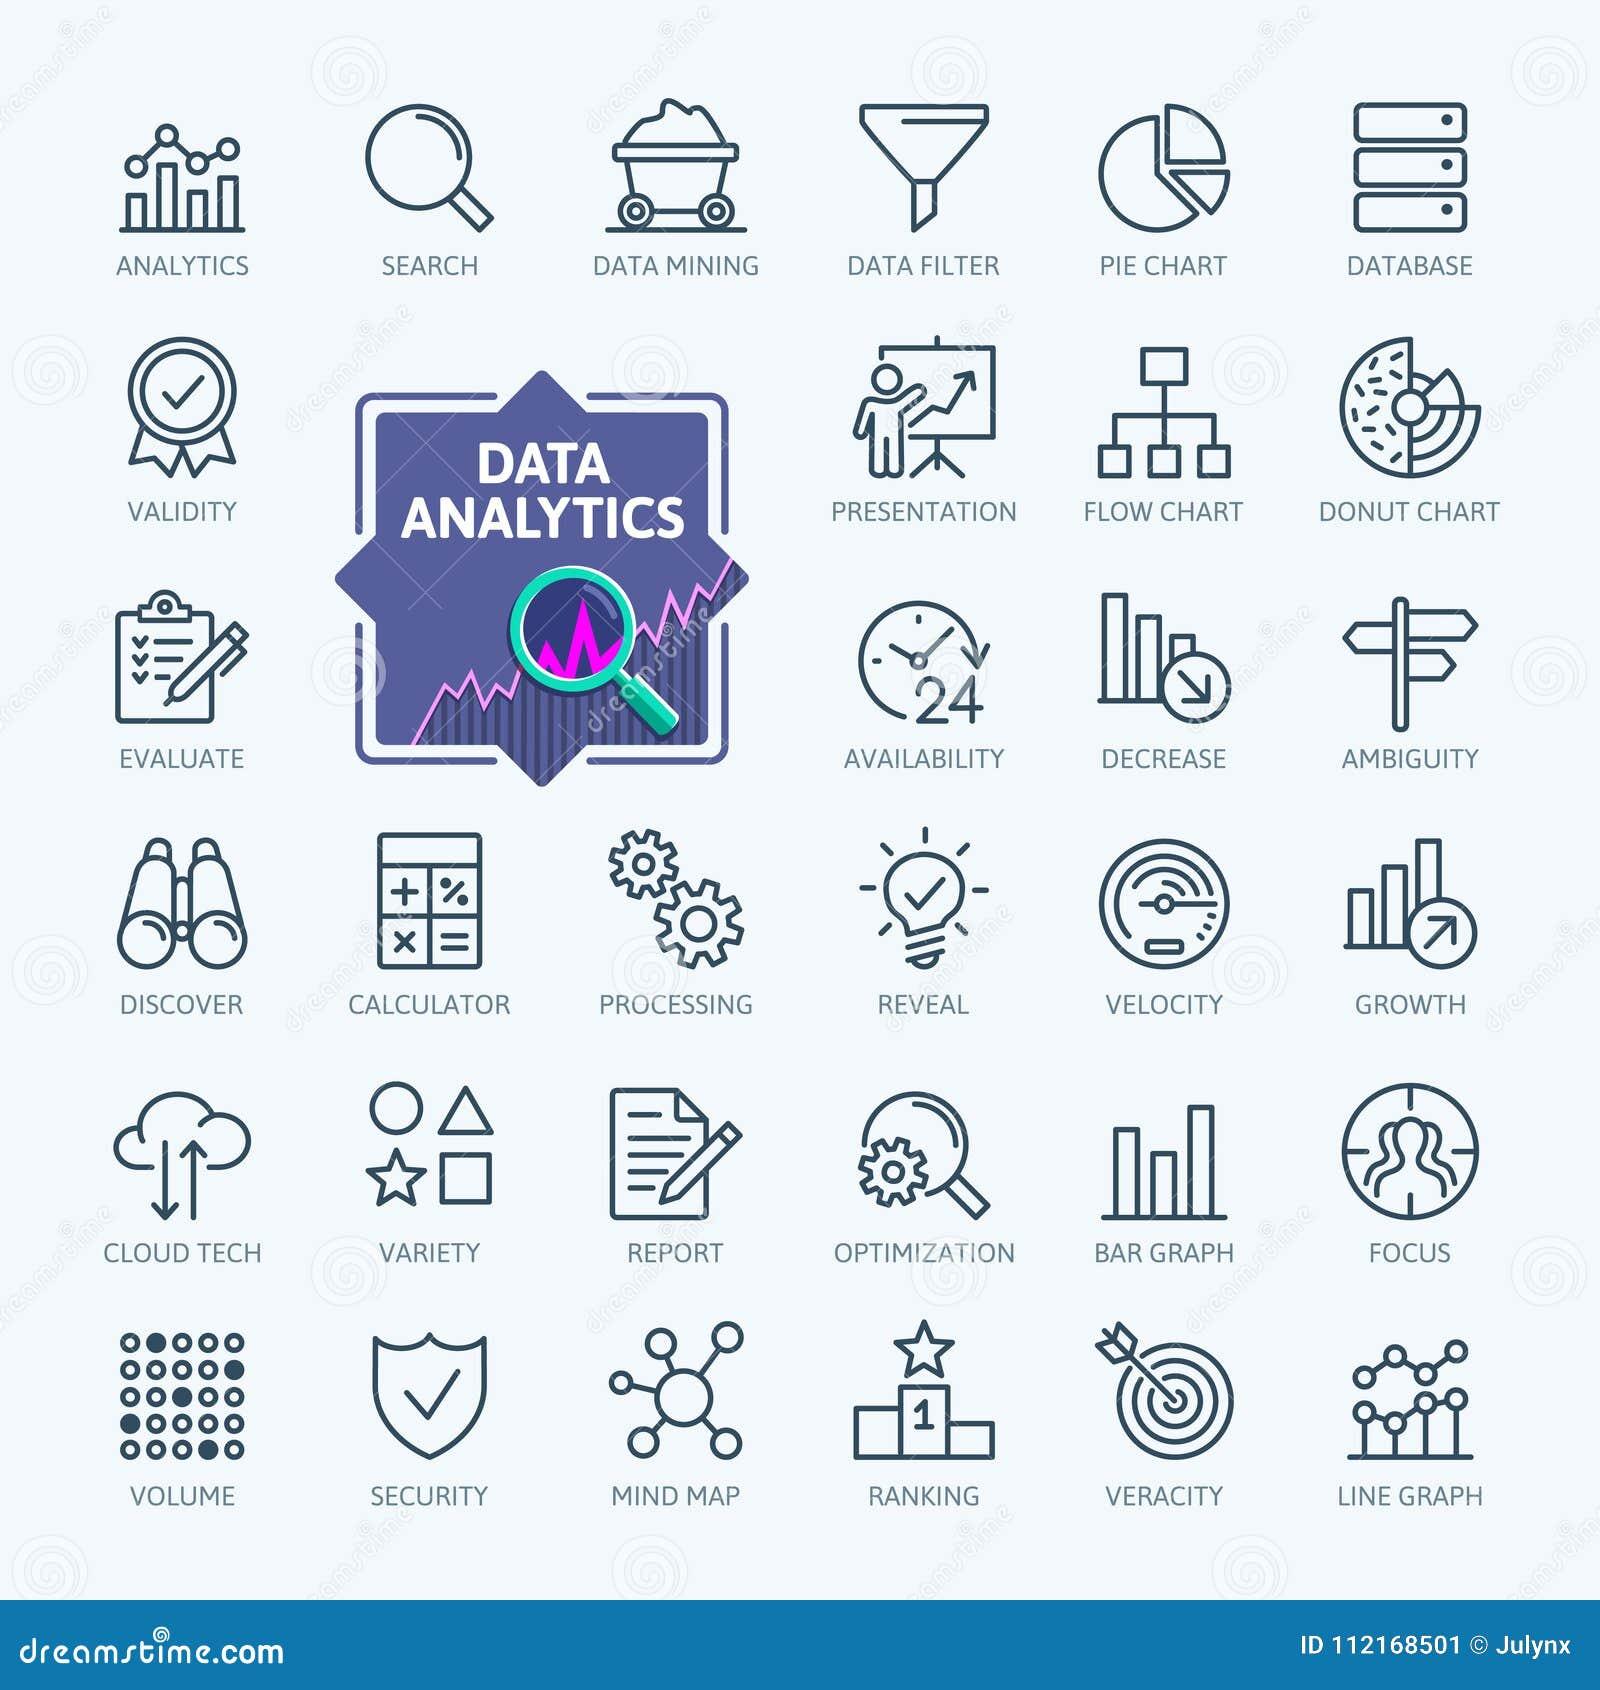 Data analysis, statistics, analytics - minimal thin line web icon set. Outline icons collection